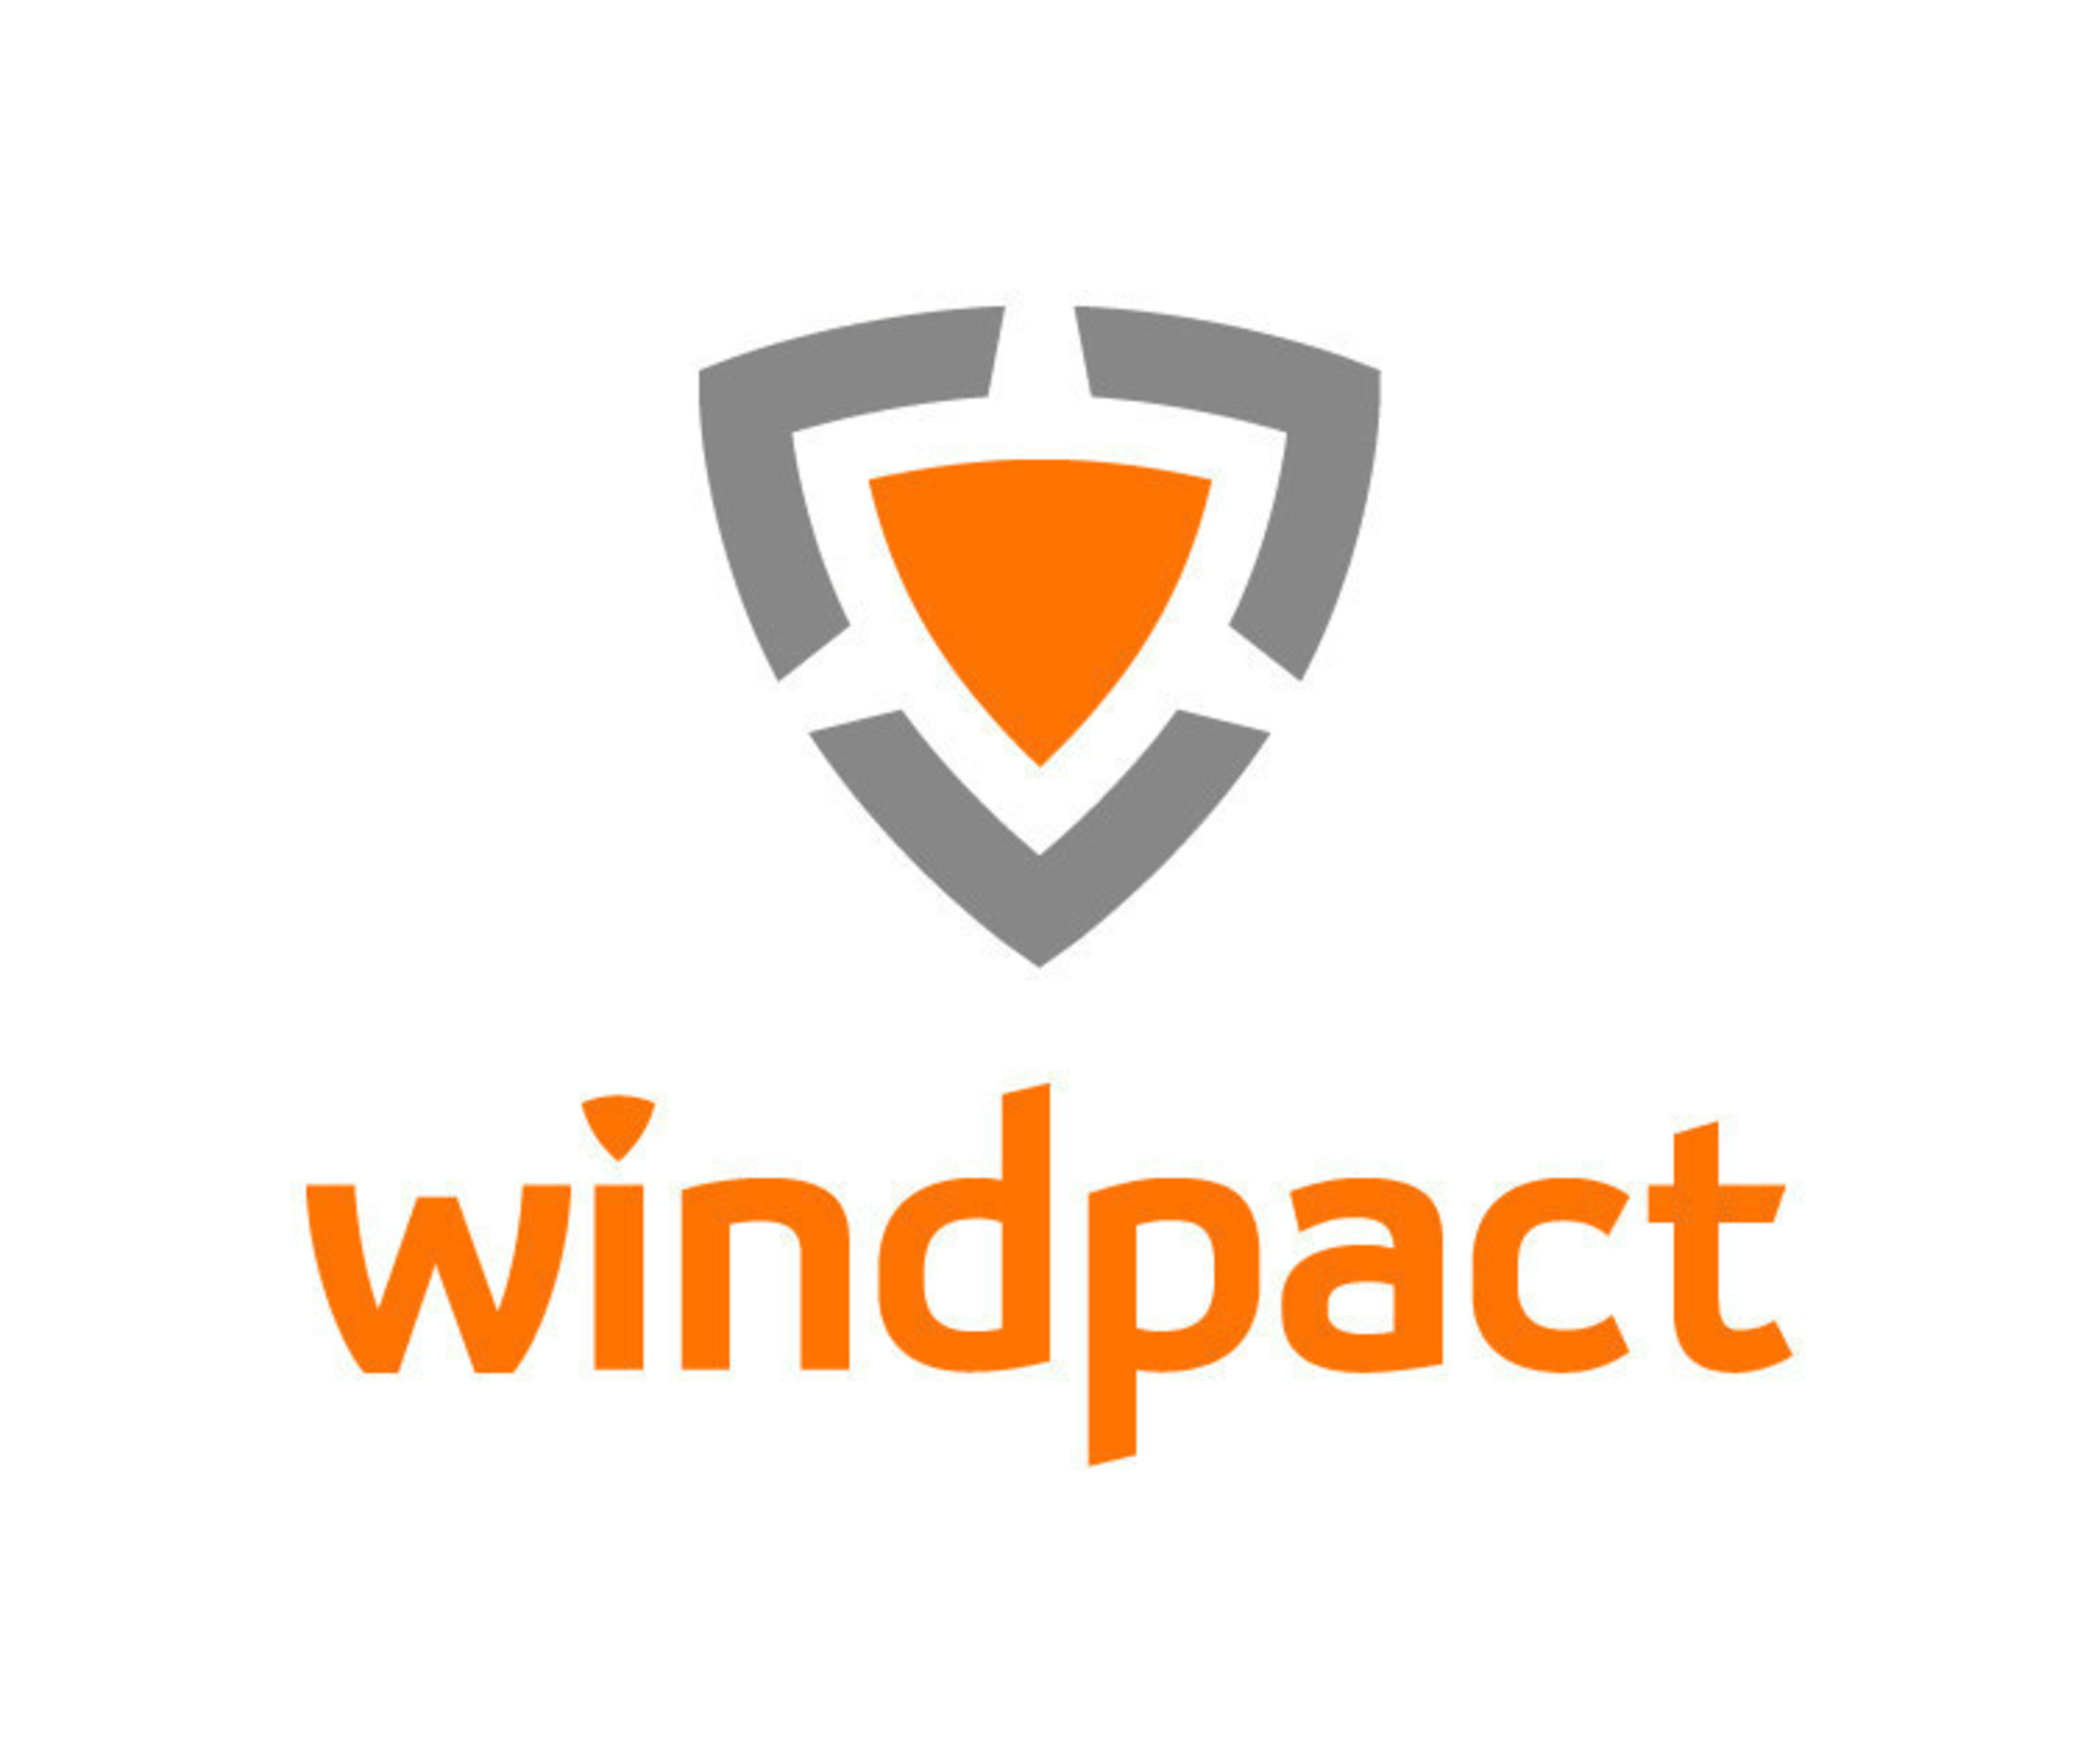 Windpact Logo